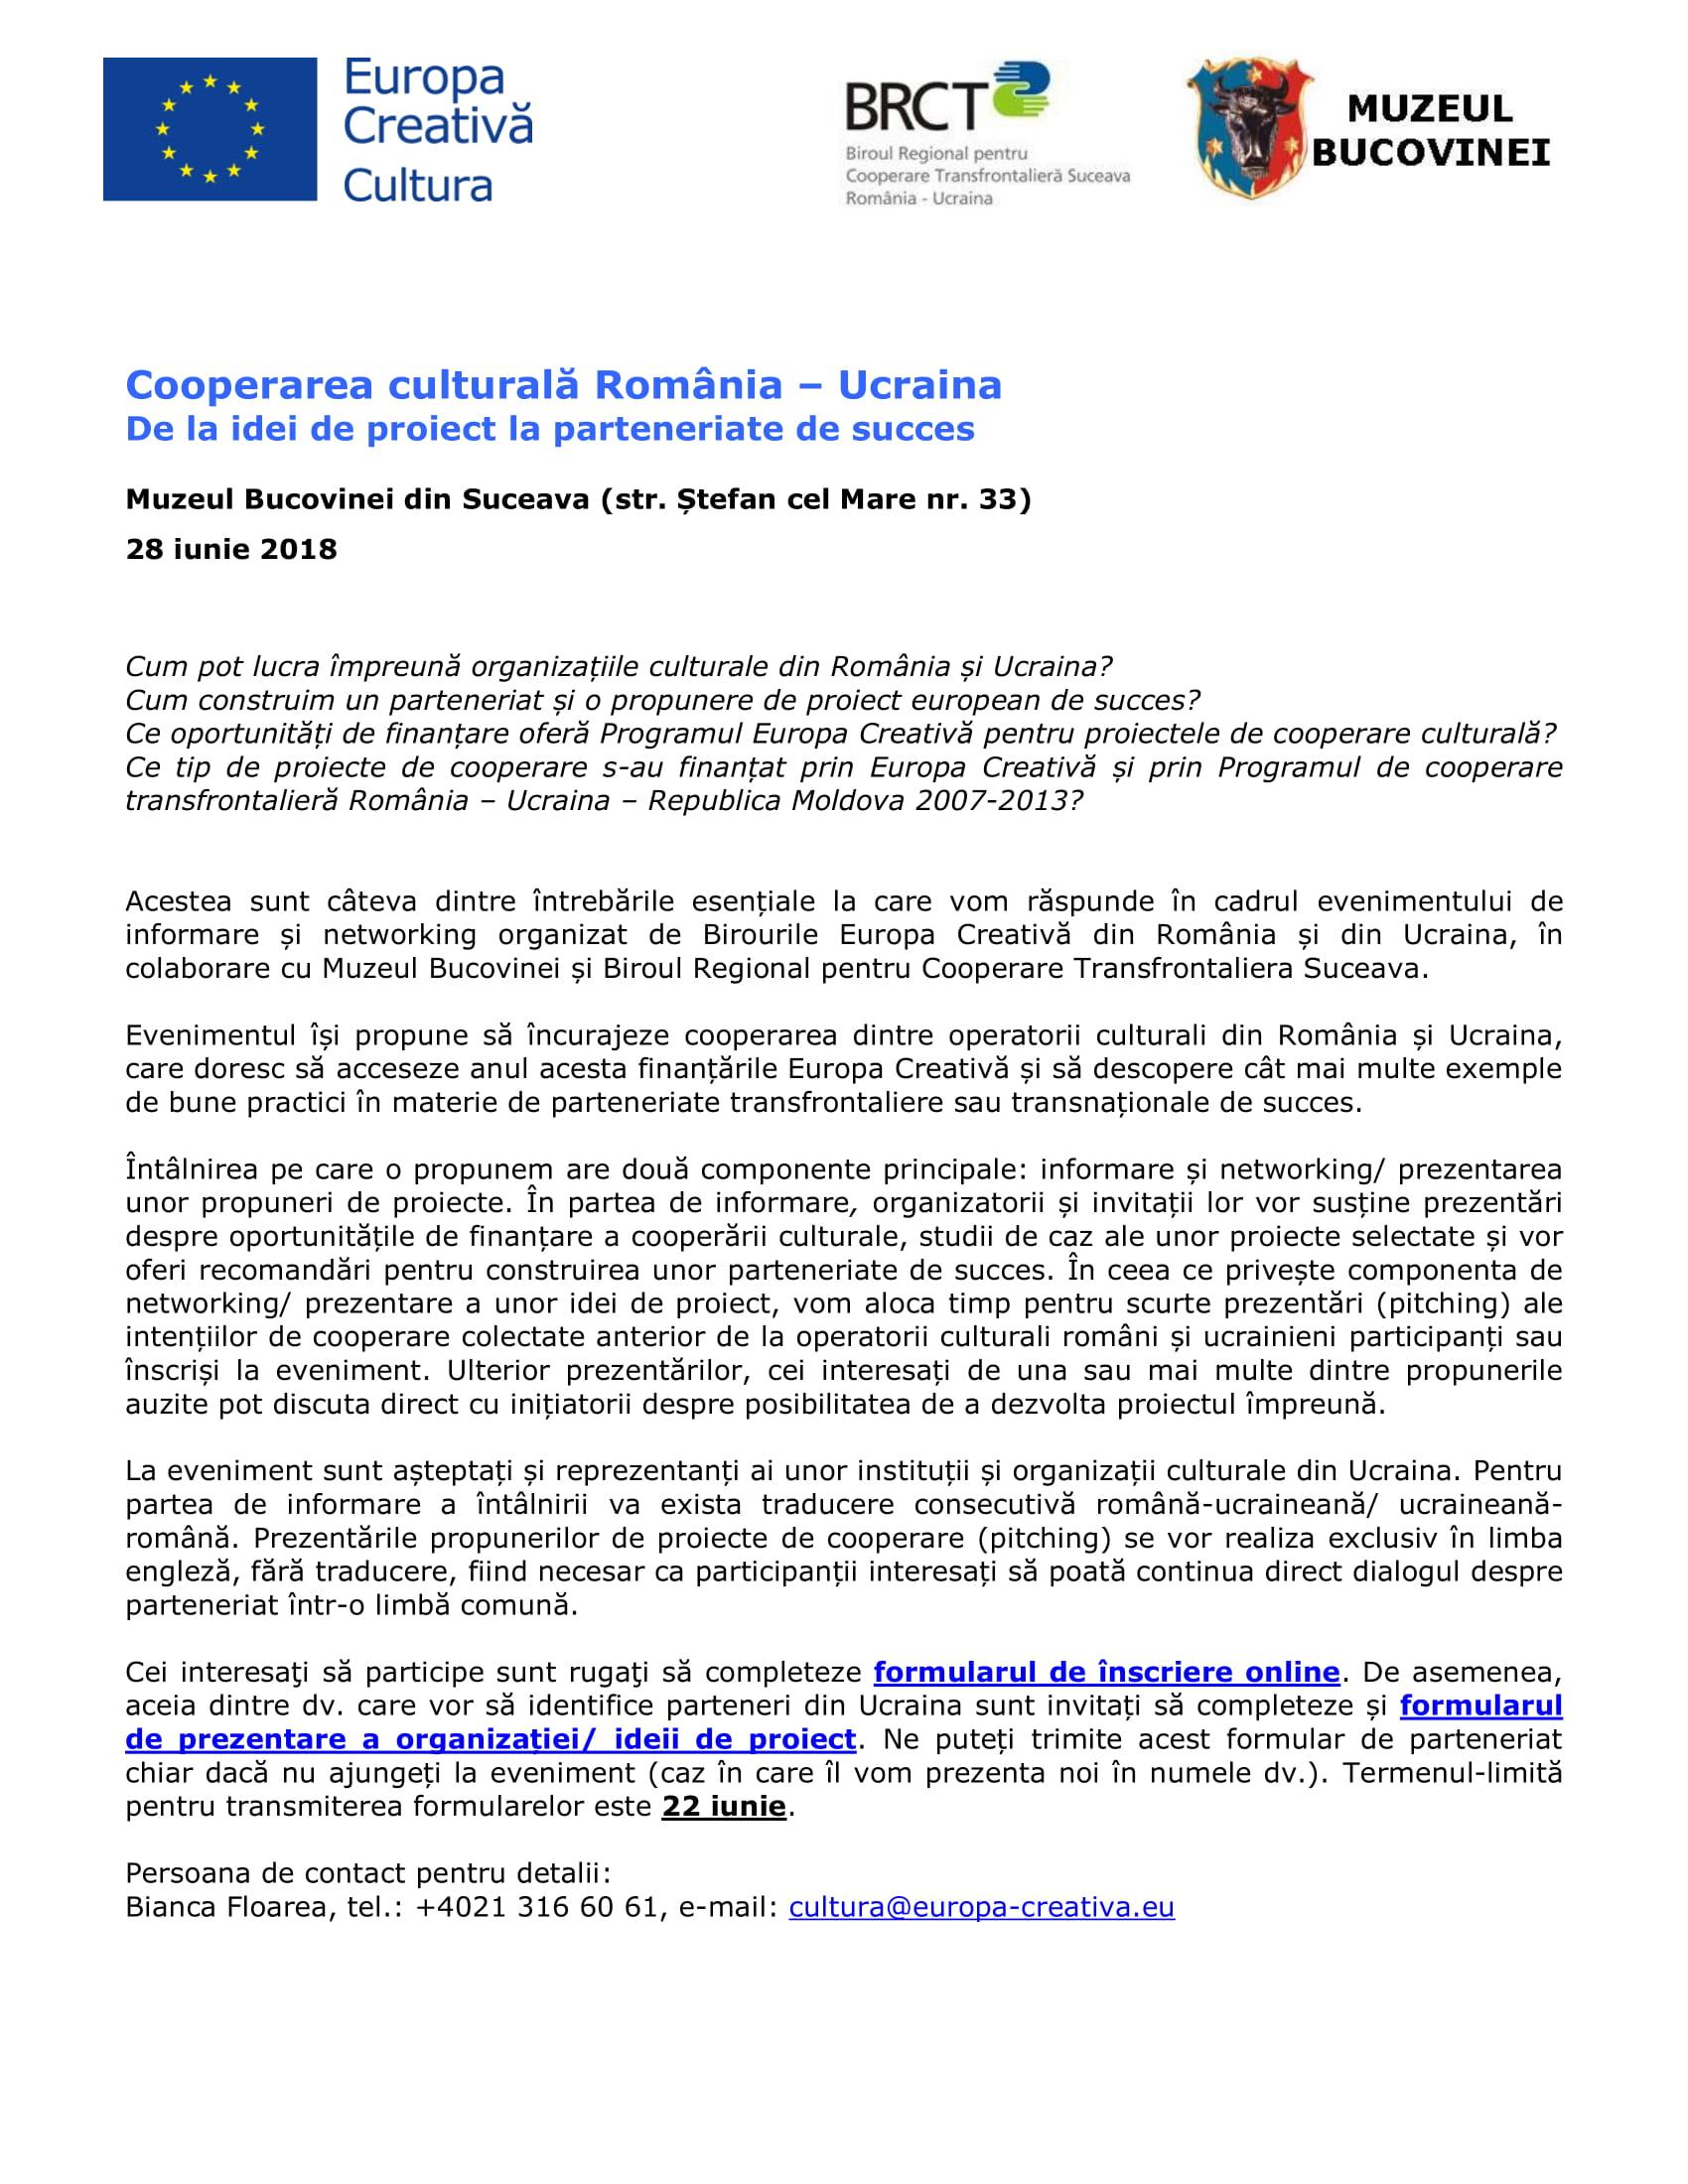 Descriere si agenda Suceava 28 iunie 2018-1